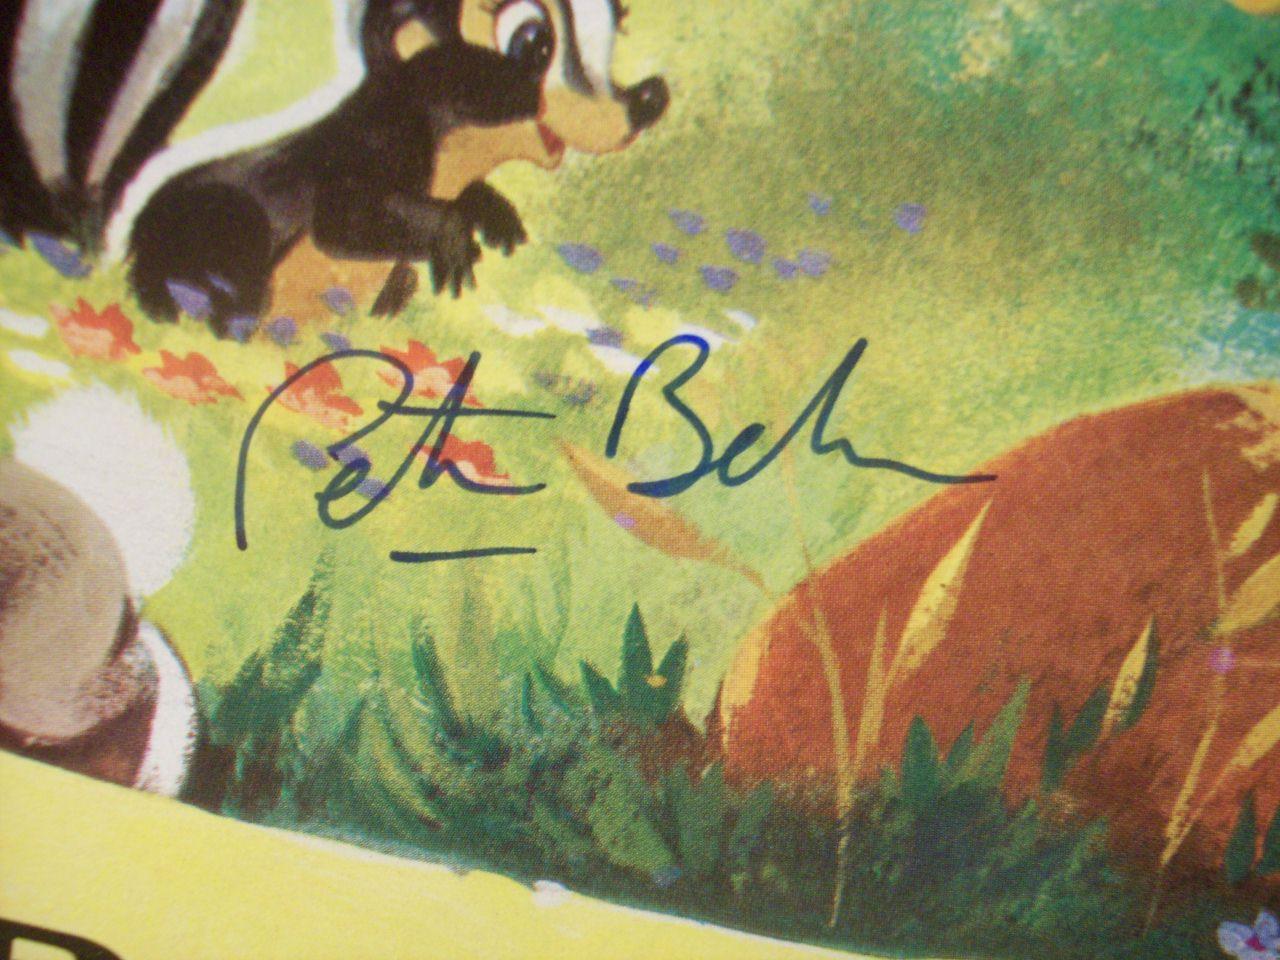 Dunegan, Donnie Connie King Peter Behn LP Signed Autograph Walt Disney'S Bambi Disney Disneyland 1960